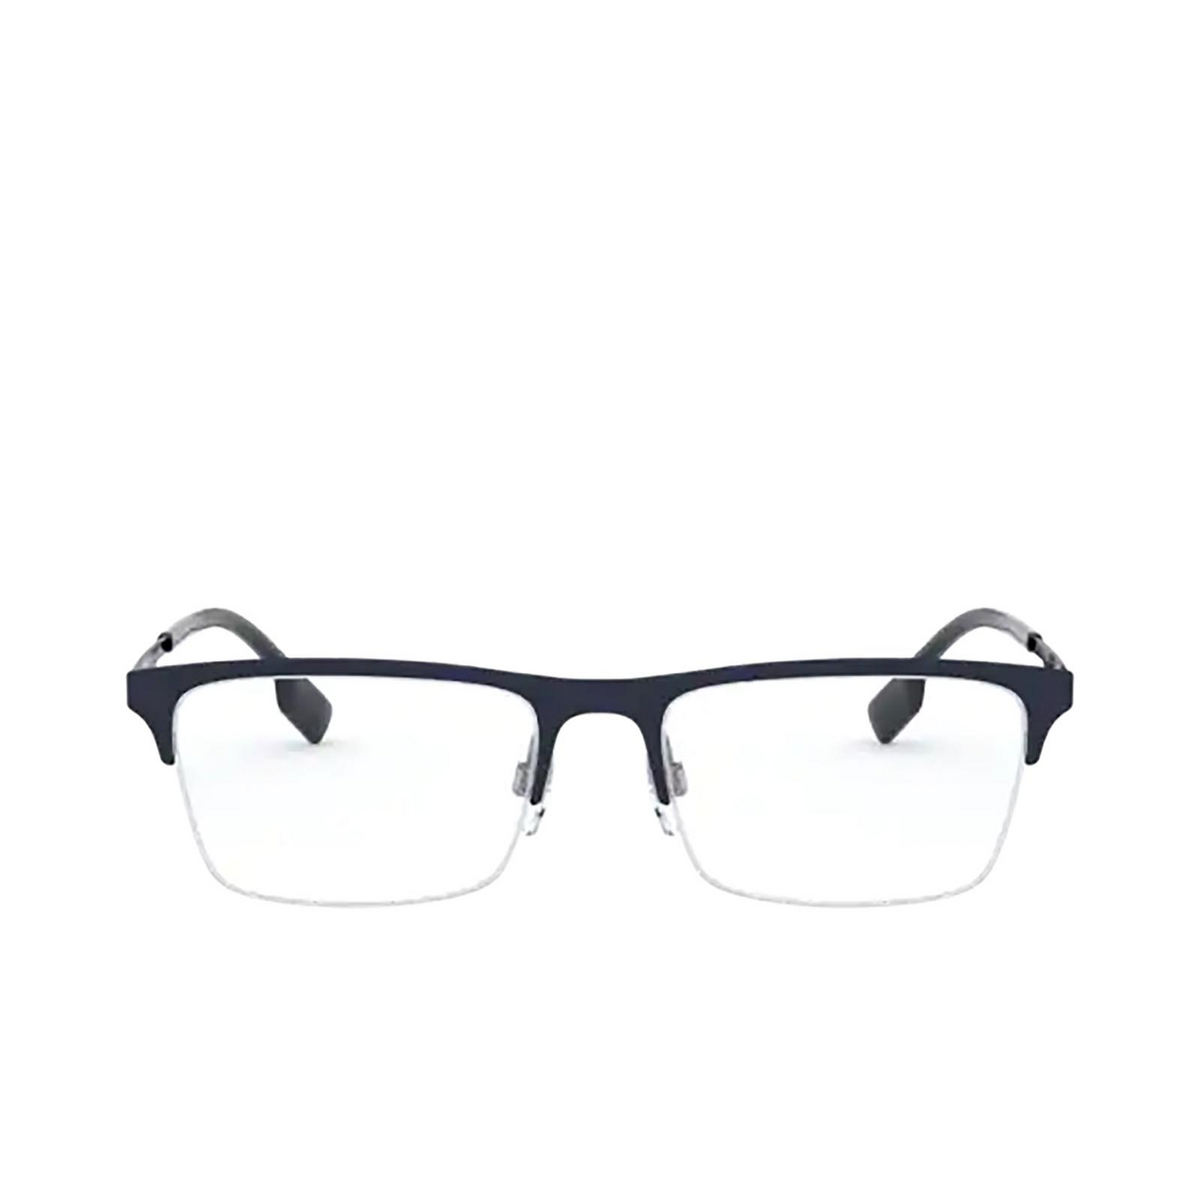 Burberry® Rectangle Eyeglasses: Brunel BE1344 color Matte Blue 1274 - front view.